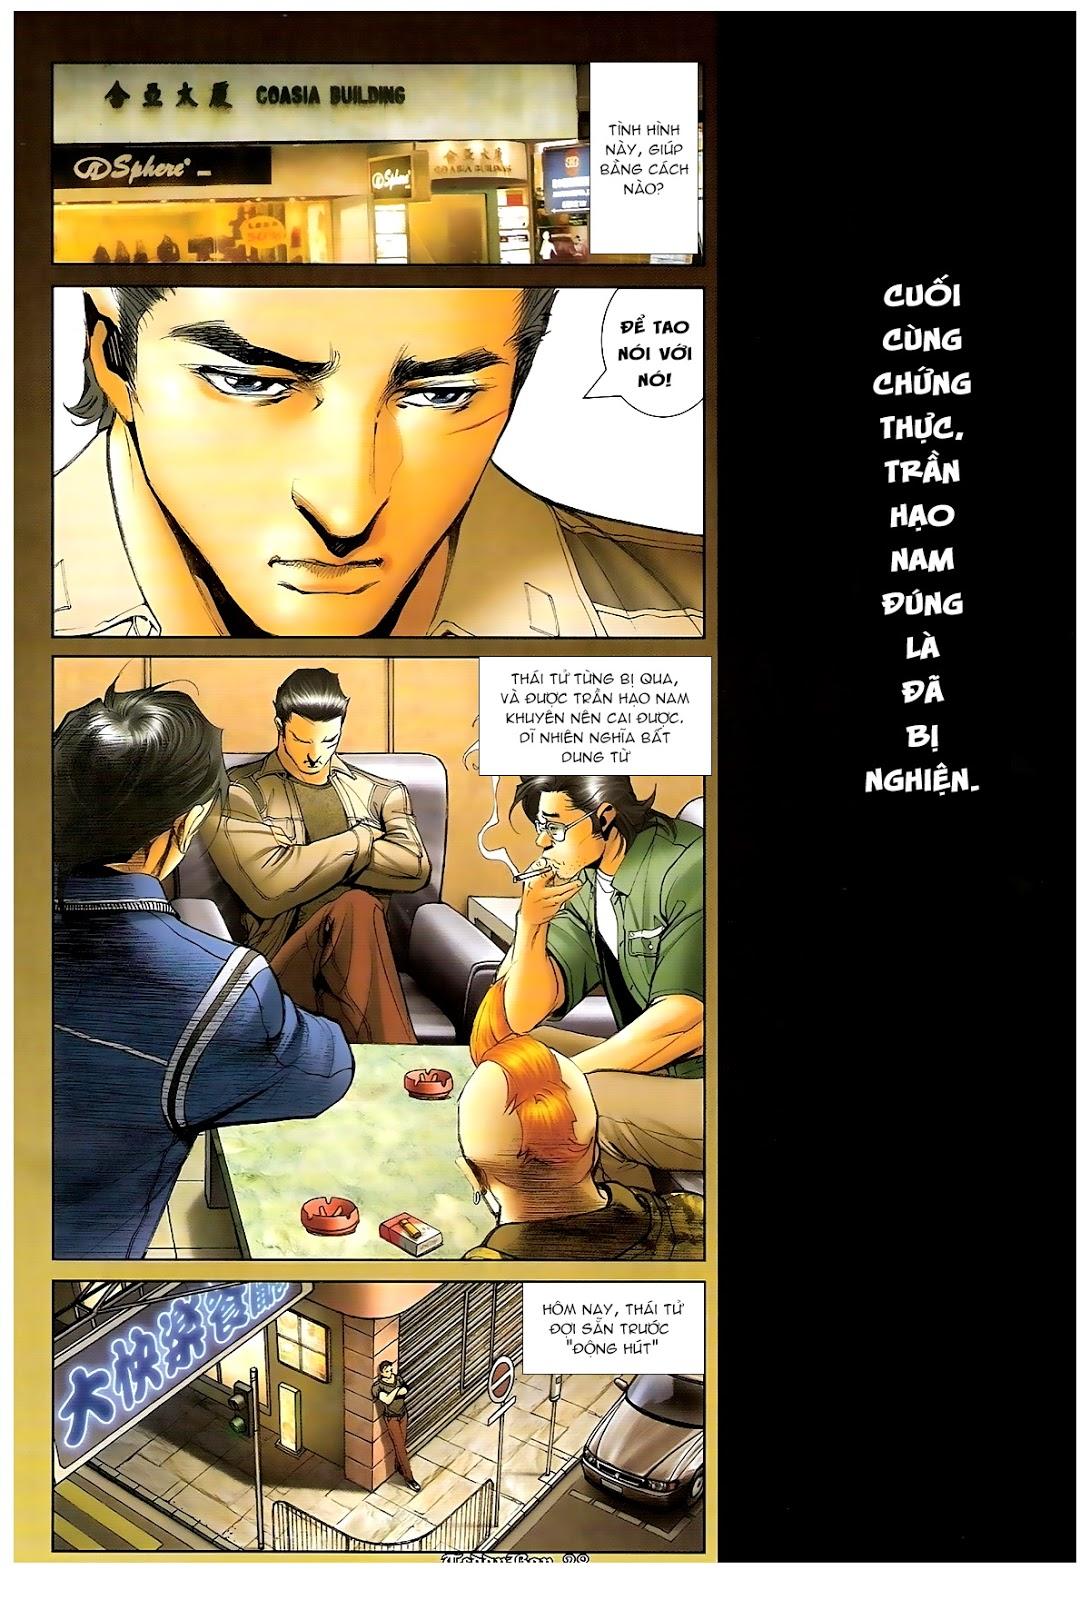 Người Trong Giang Hồ - Chapter 1209: Cai nghiện - Pic 25